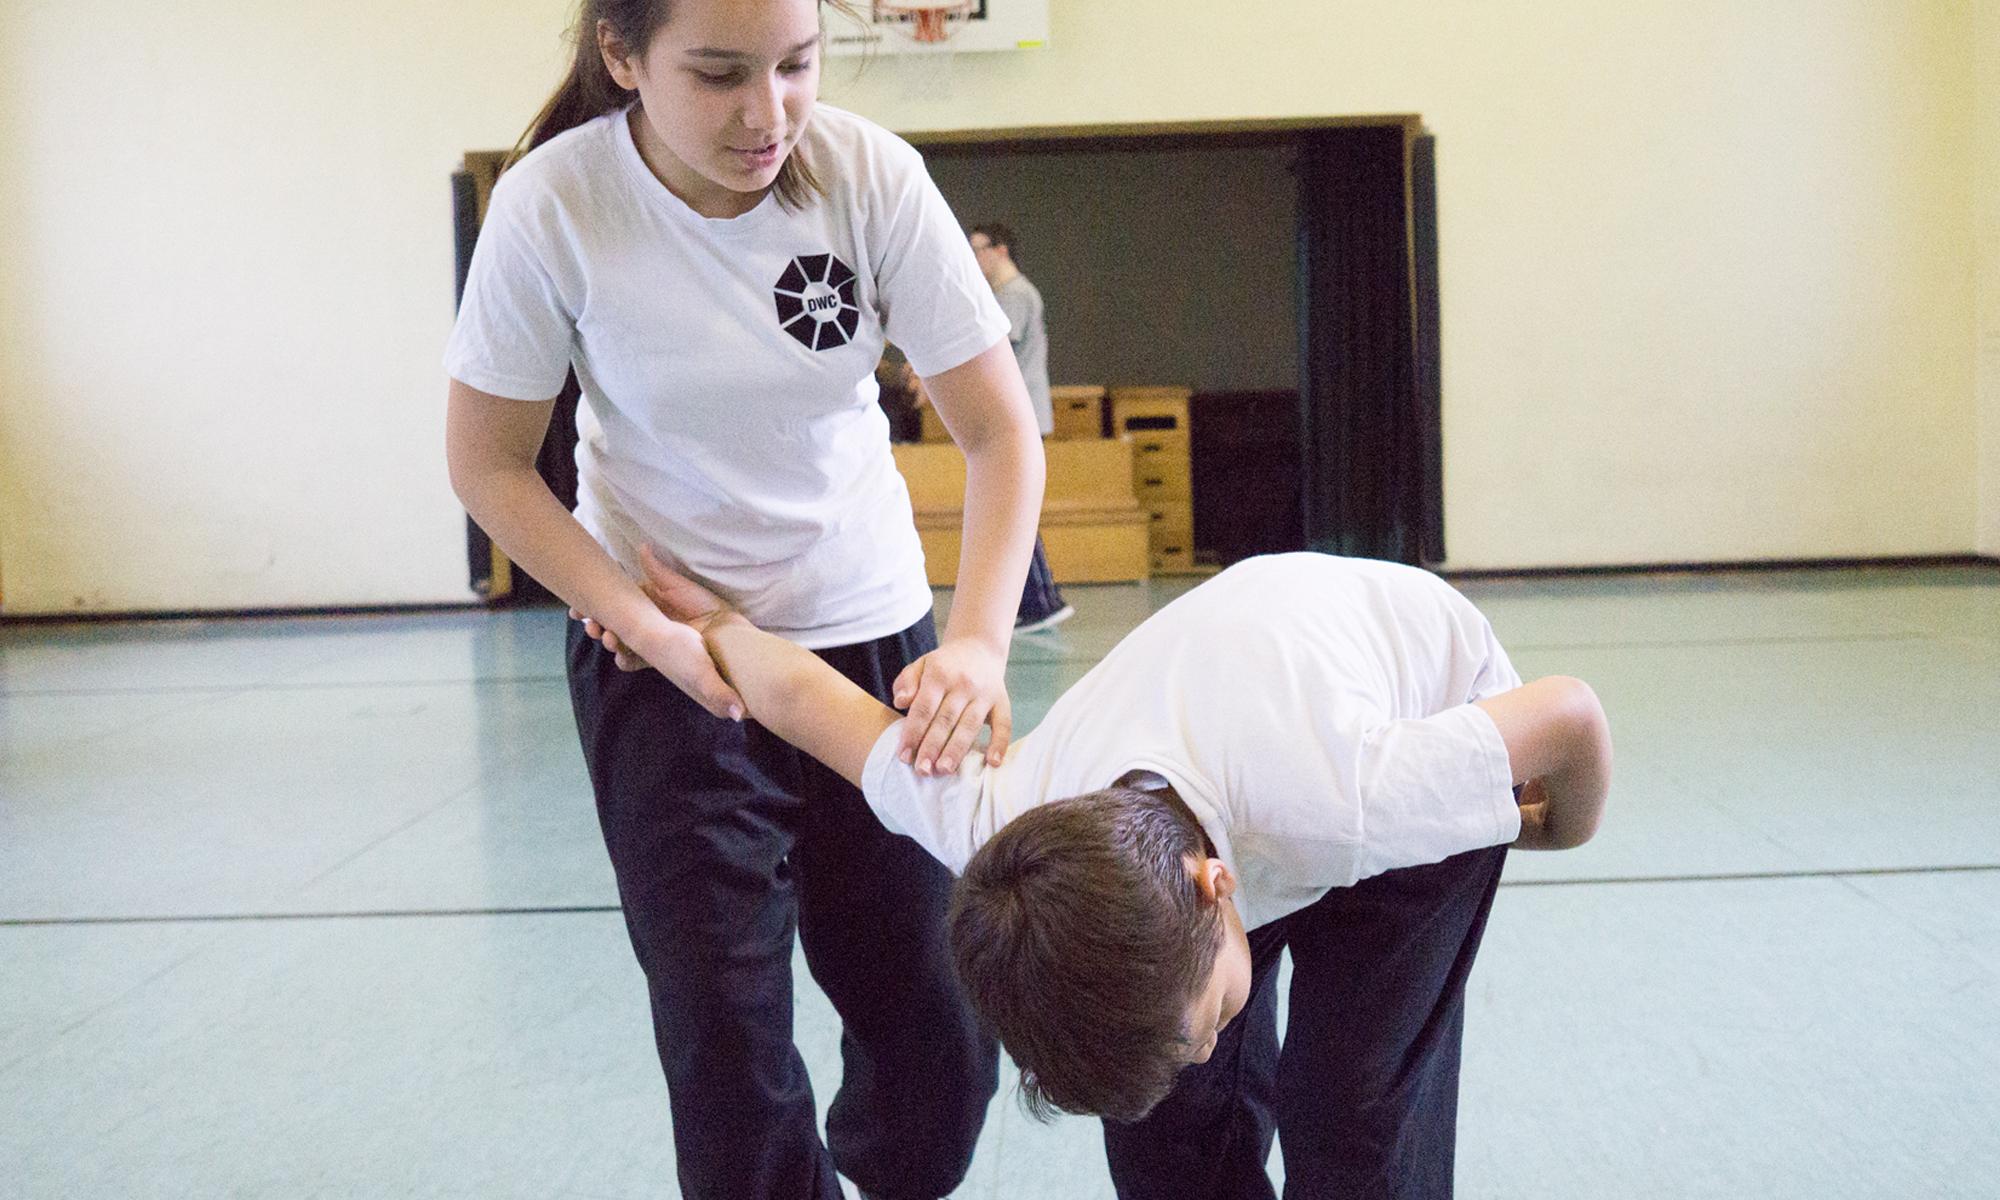 Kinder lernen Selbteverteidilgung